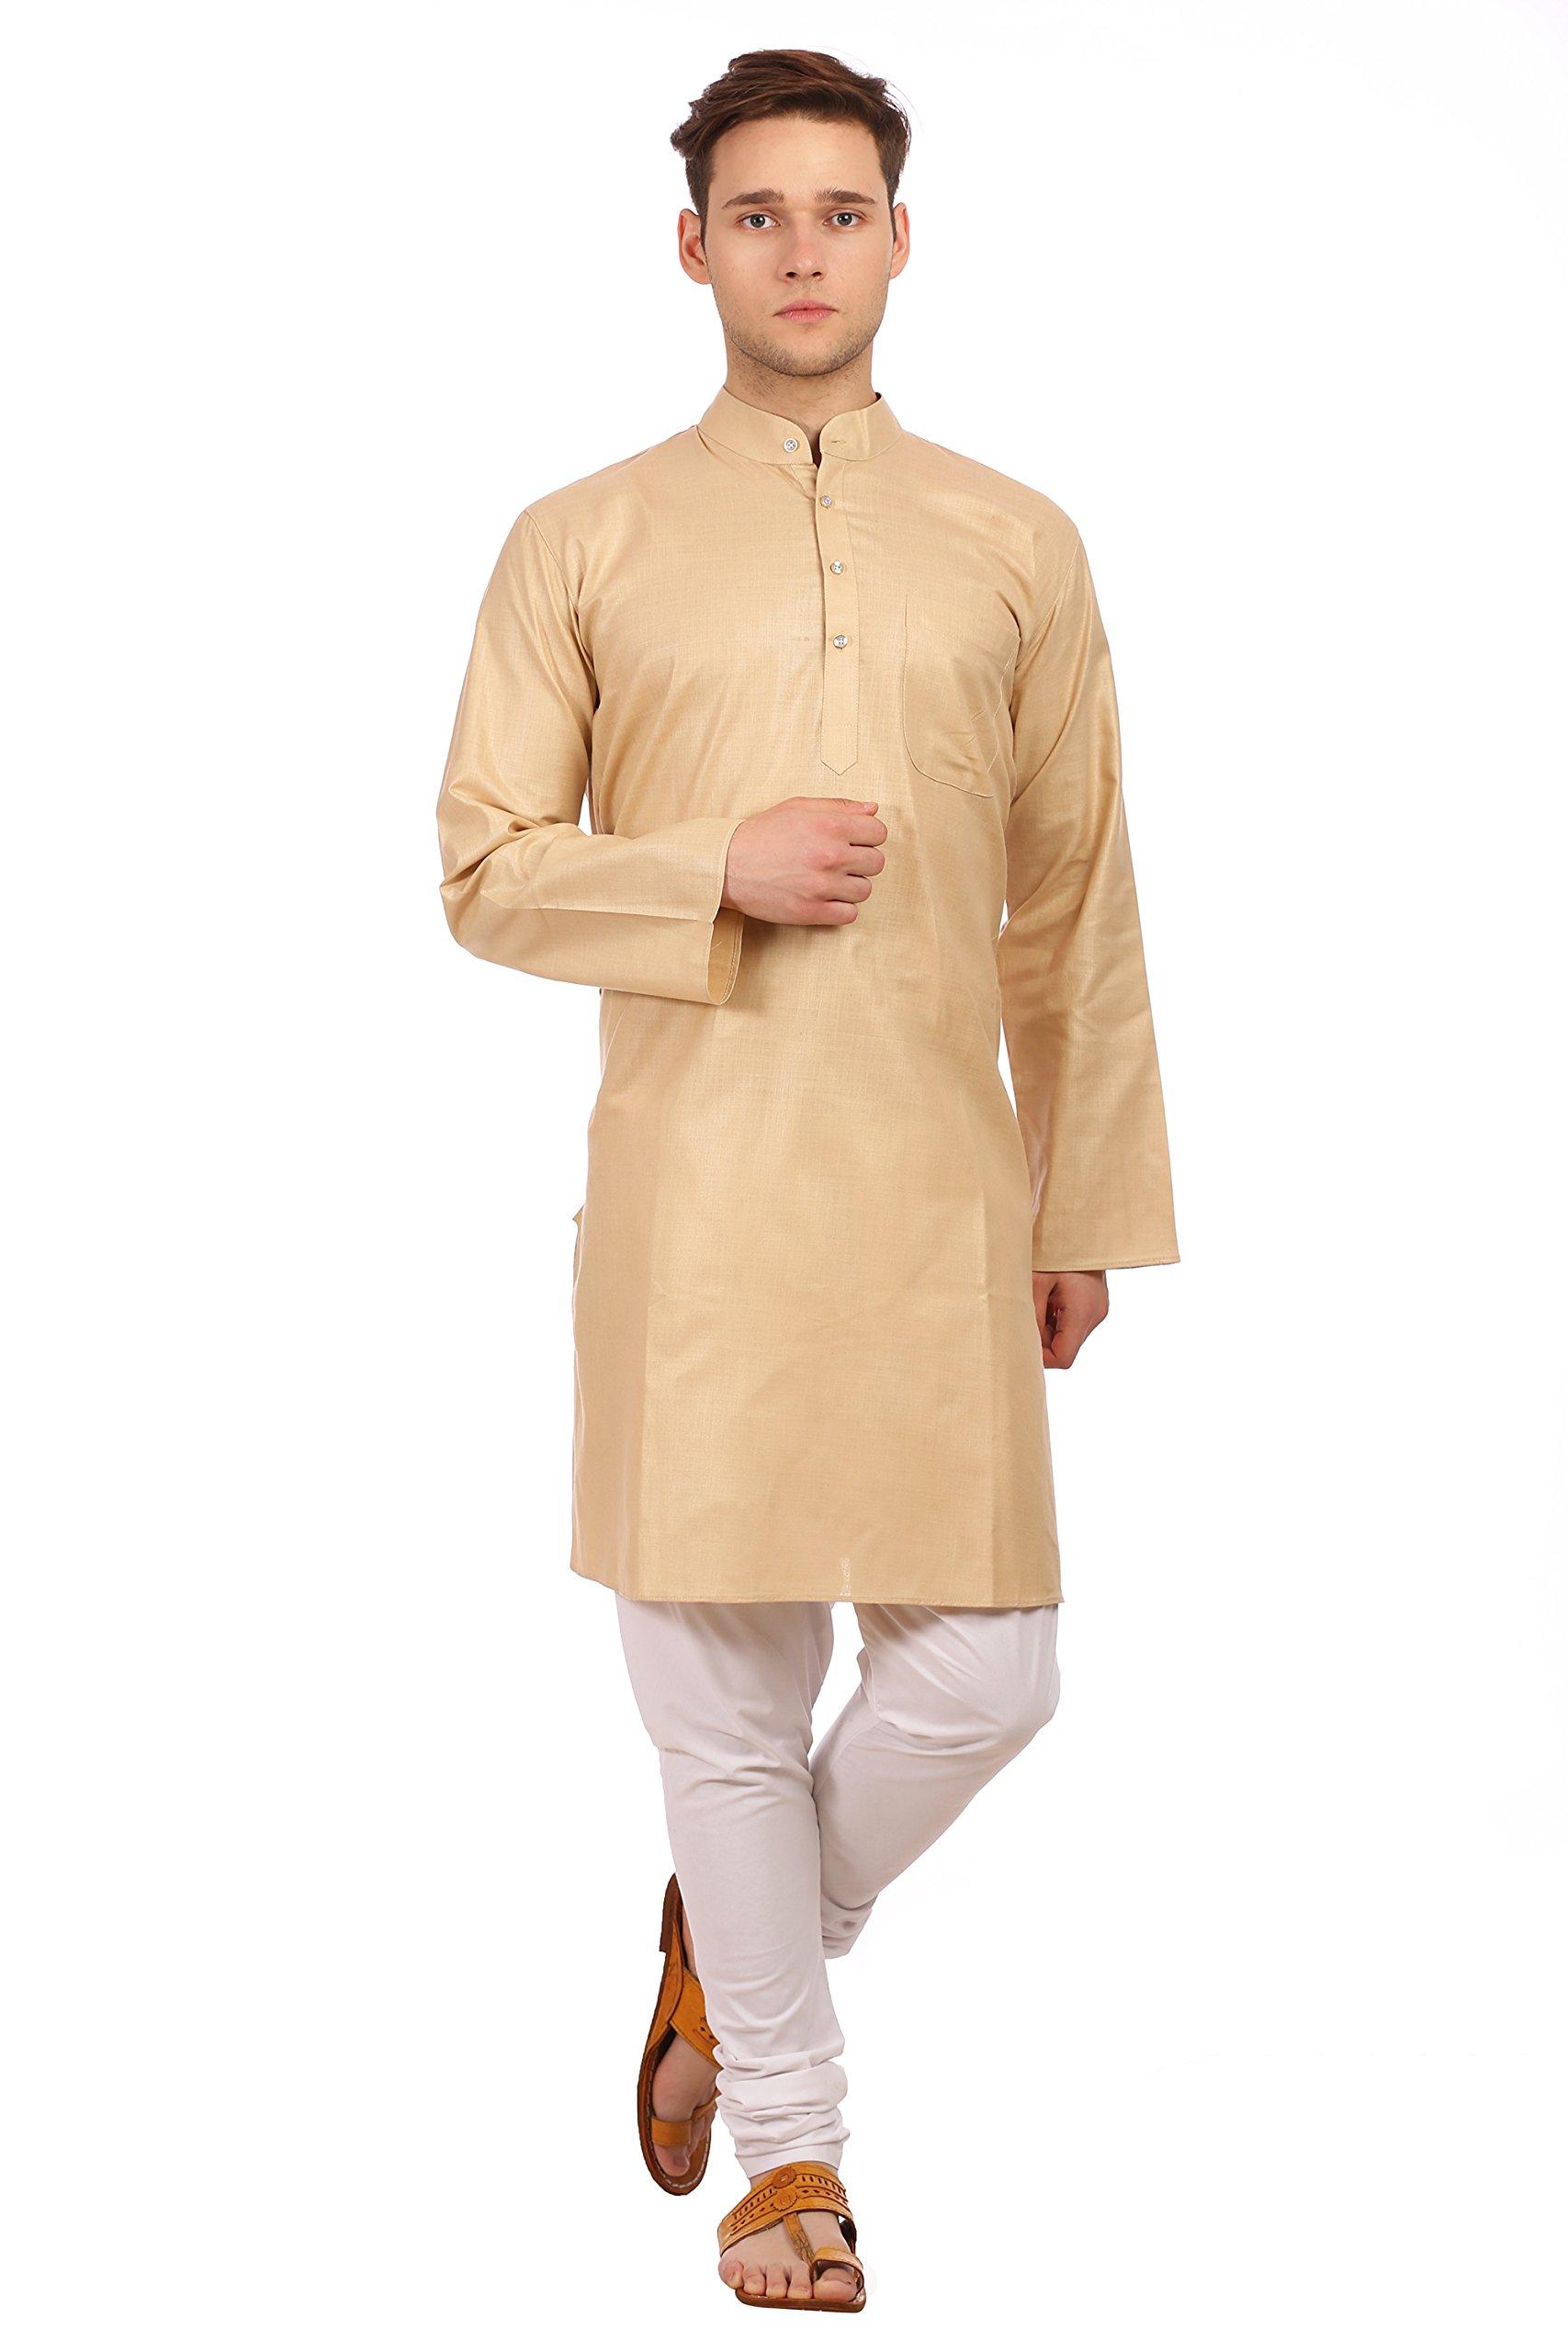 WINTAGE Men's Cotton Silk Festive and Casual Khaki Kurta Pyjama